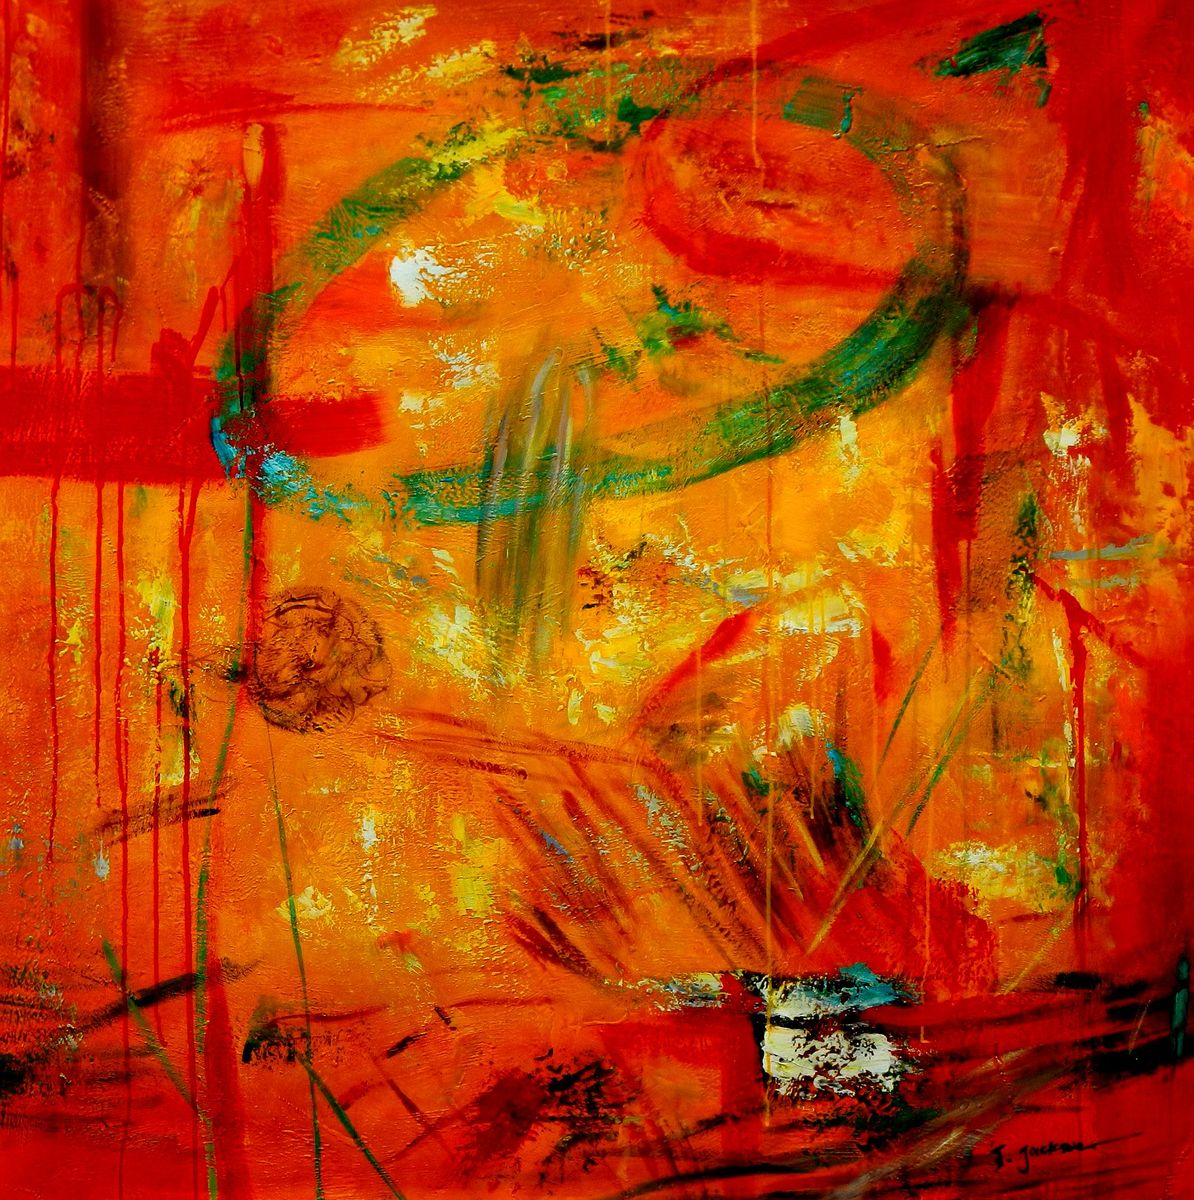 Abstract - The Angola wildlife II m96920 120x120cm abstraktes Ölbild